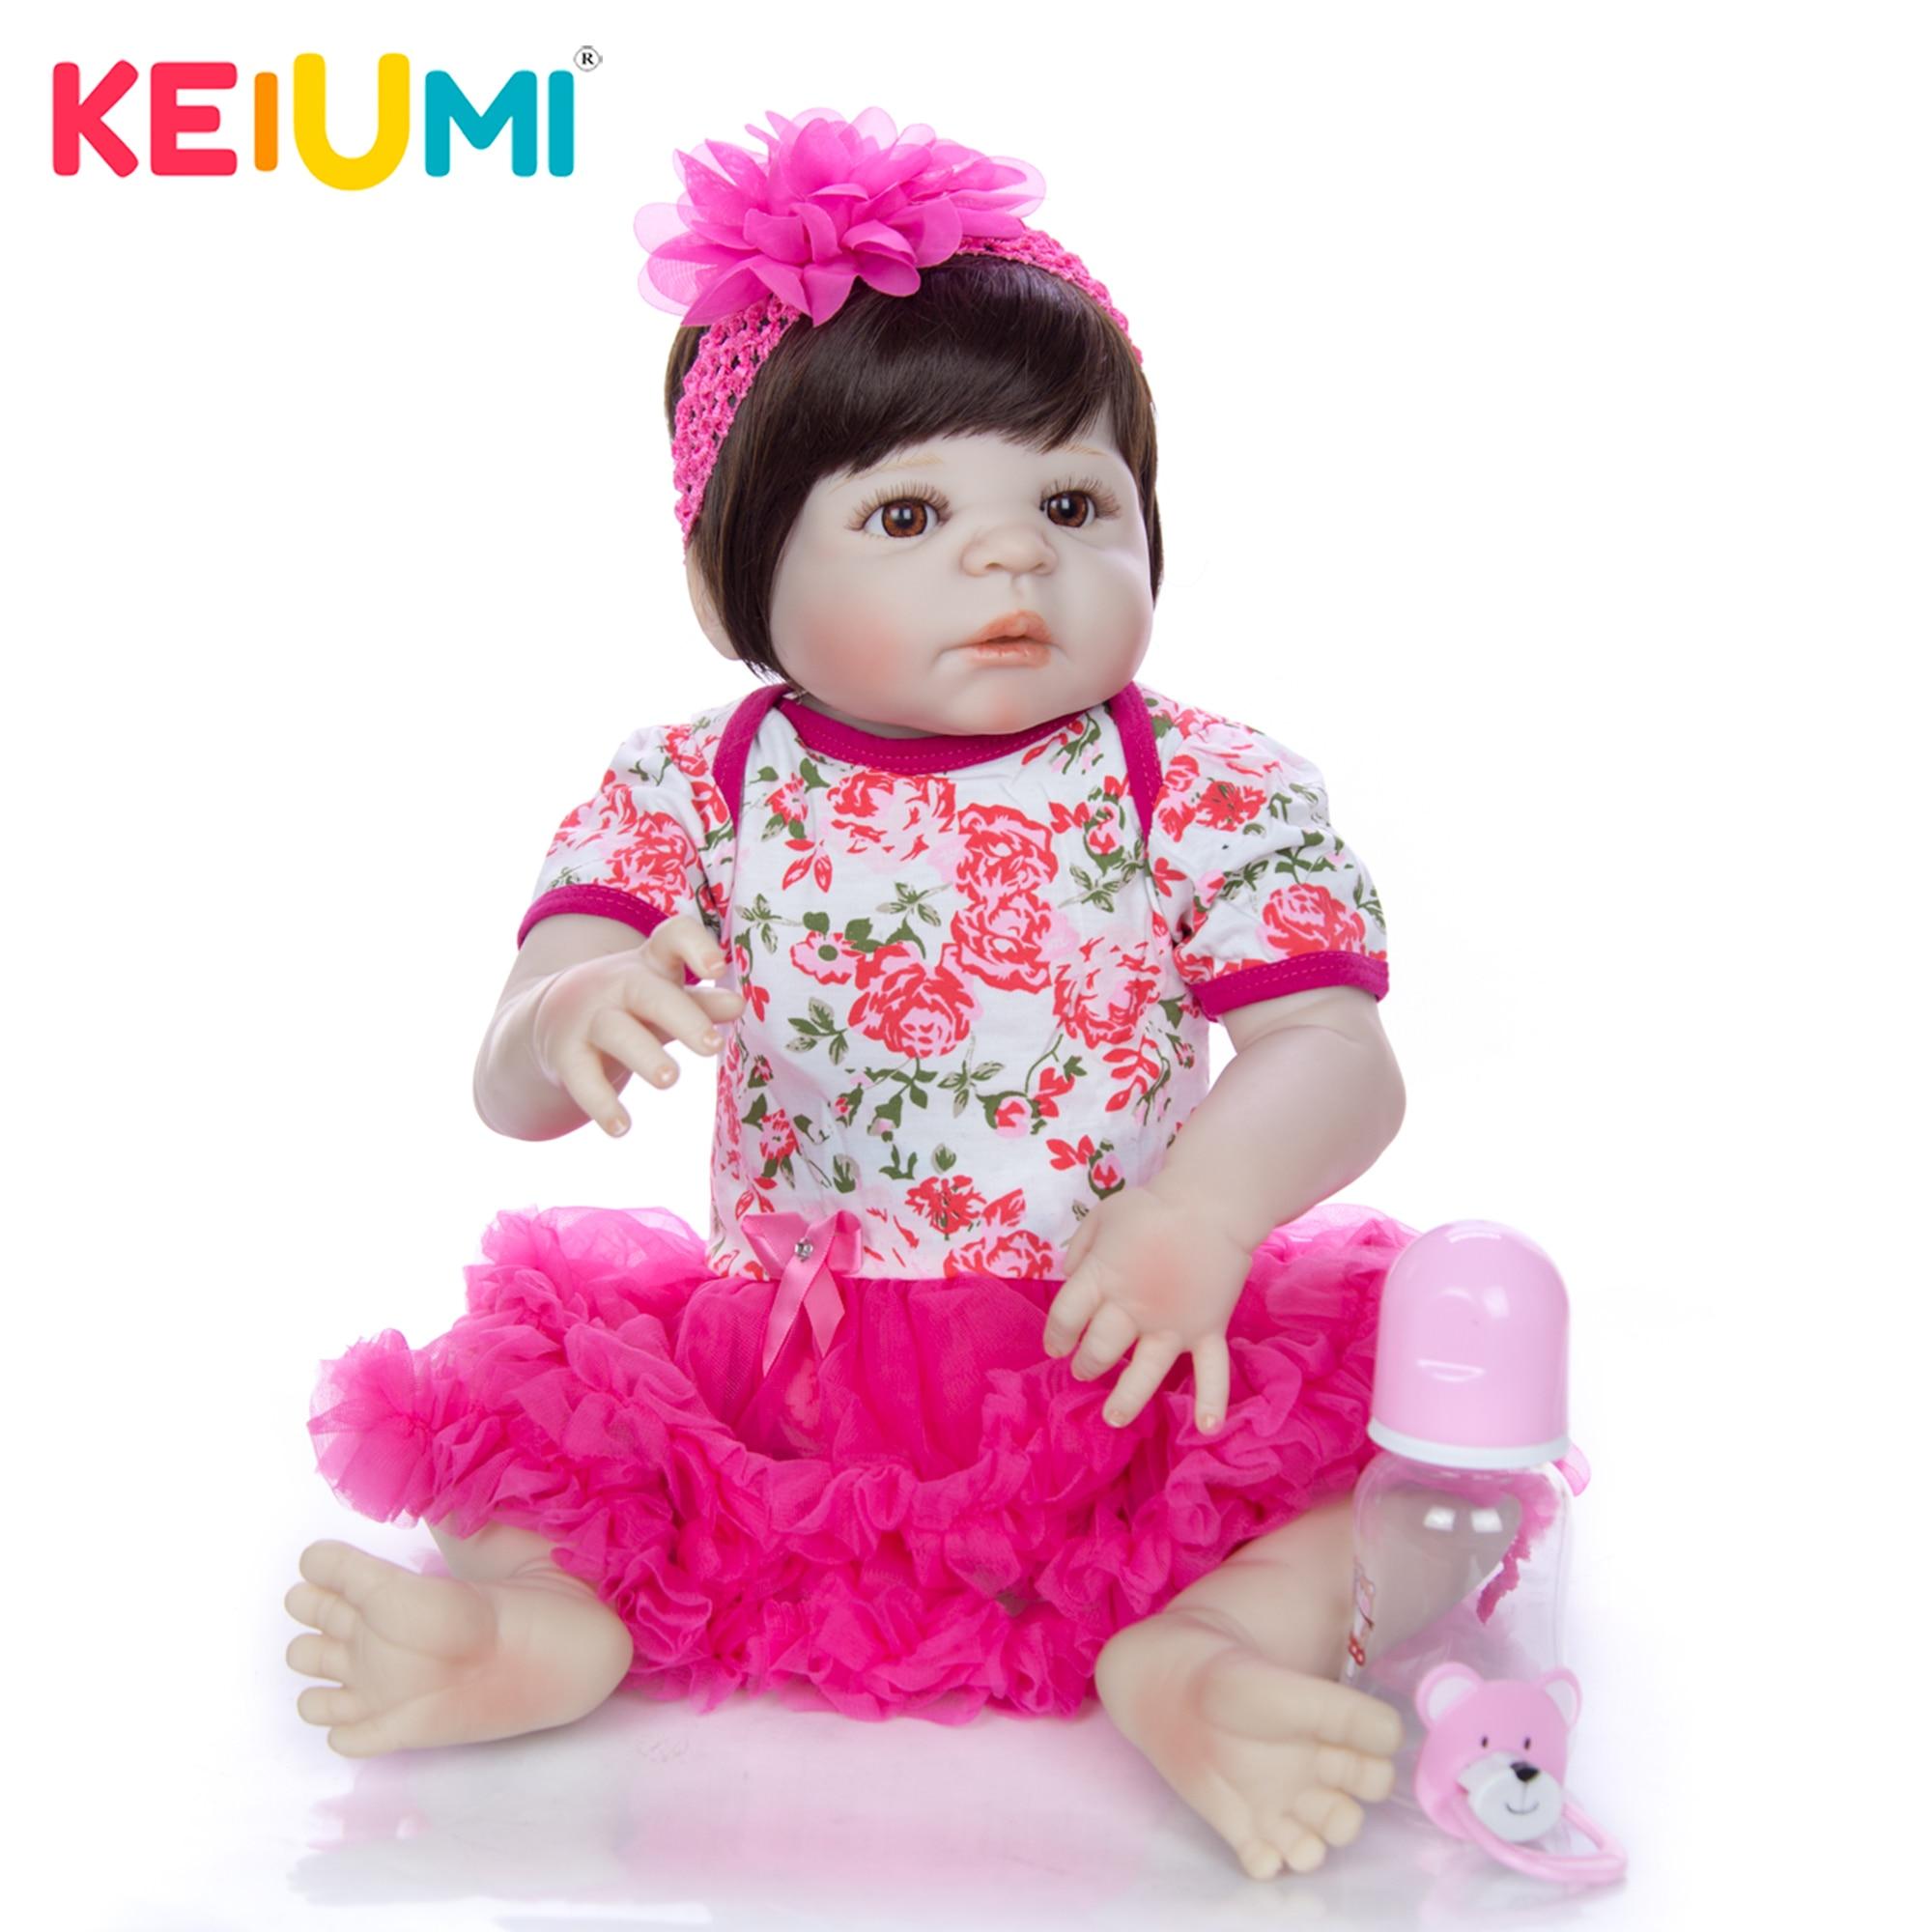 Sweet Princess Reborn Baby 23 Full Vinyl Body Silicone Babies Dolls True to Like Boneca Newborn